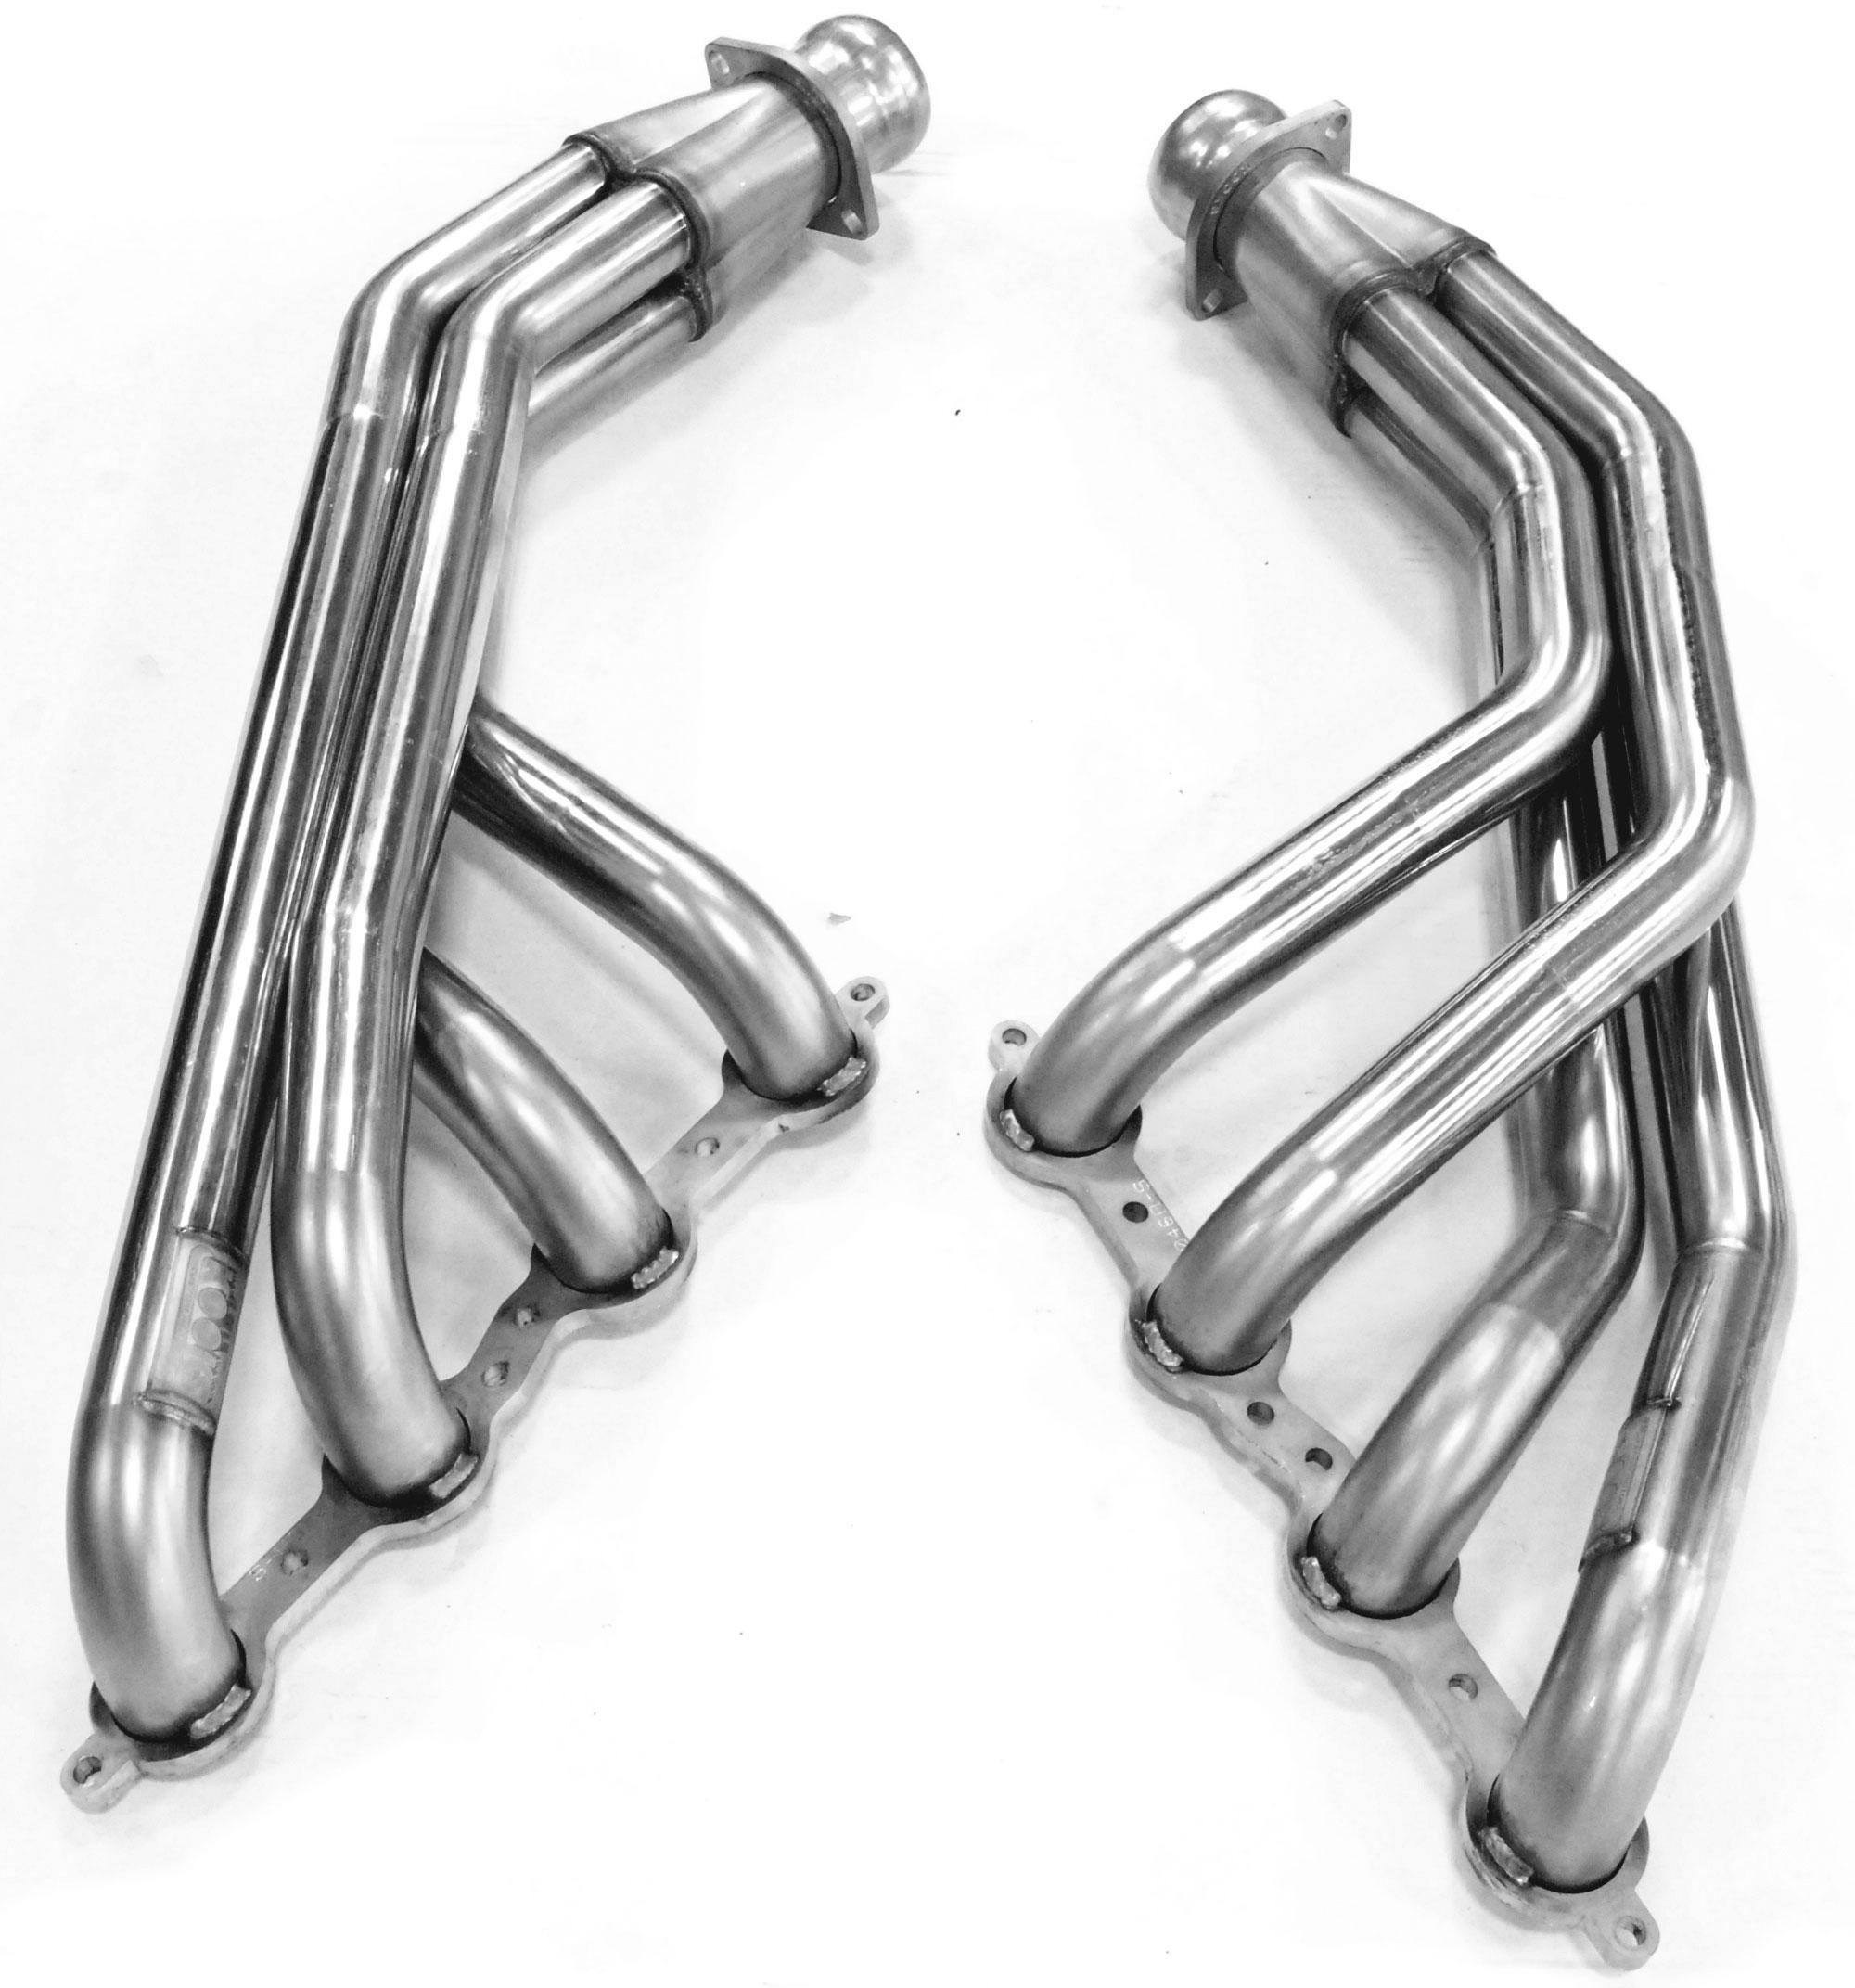 Kooks Camaro LS Engine Swap 1 7/8